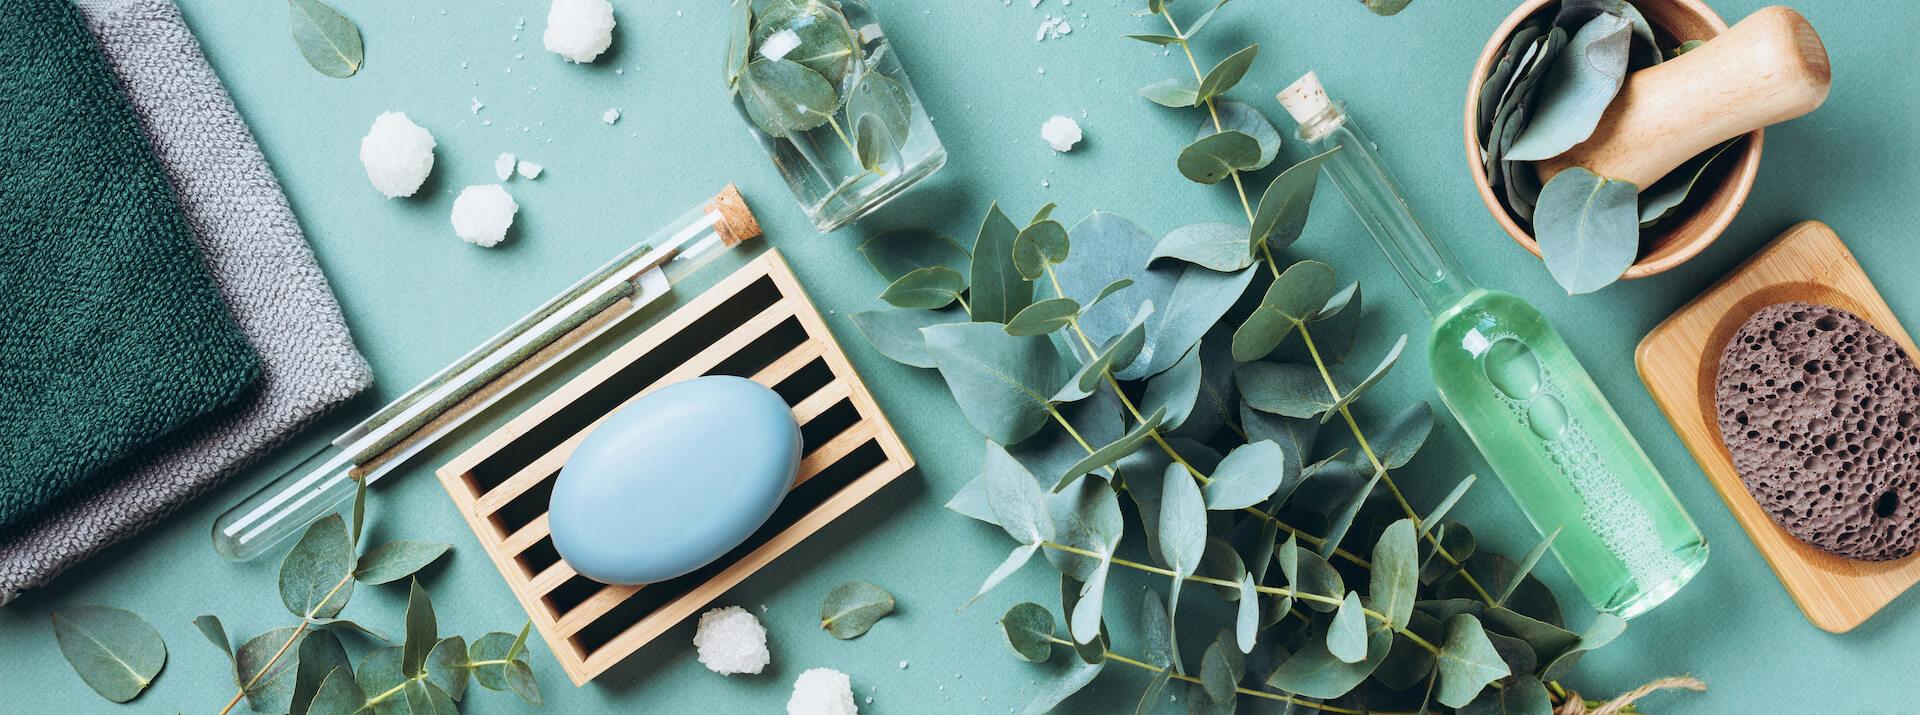 soap eucalyptus towels massage brush salt aroma oi 5YLZTF6 3 2